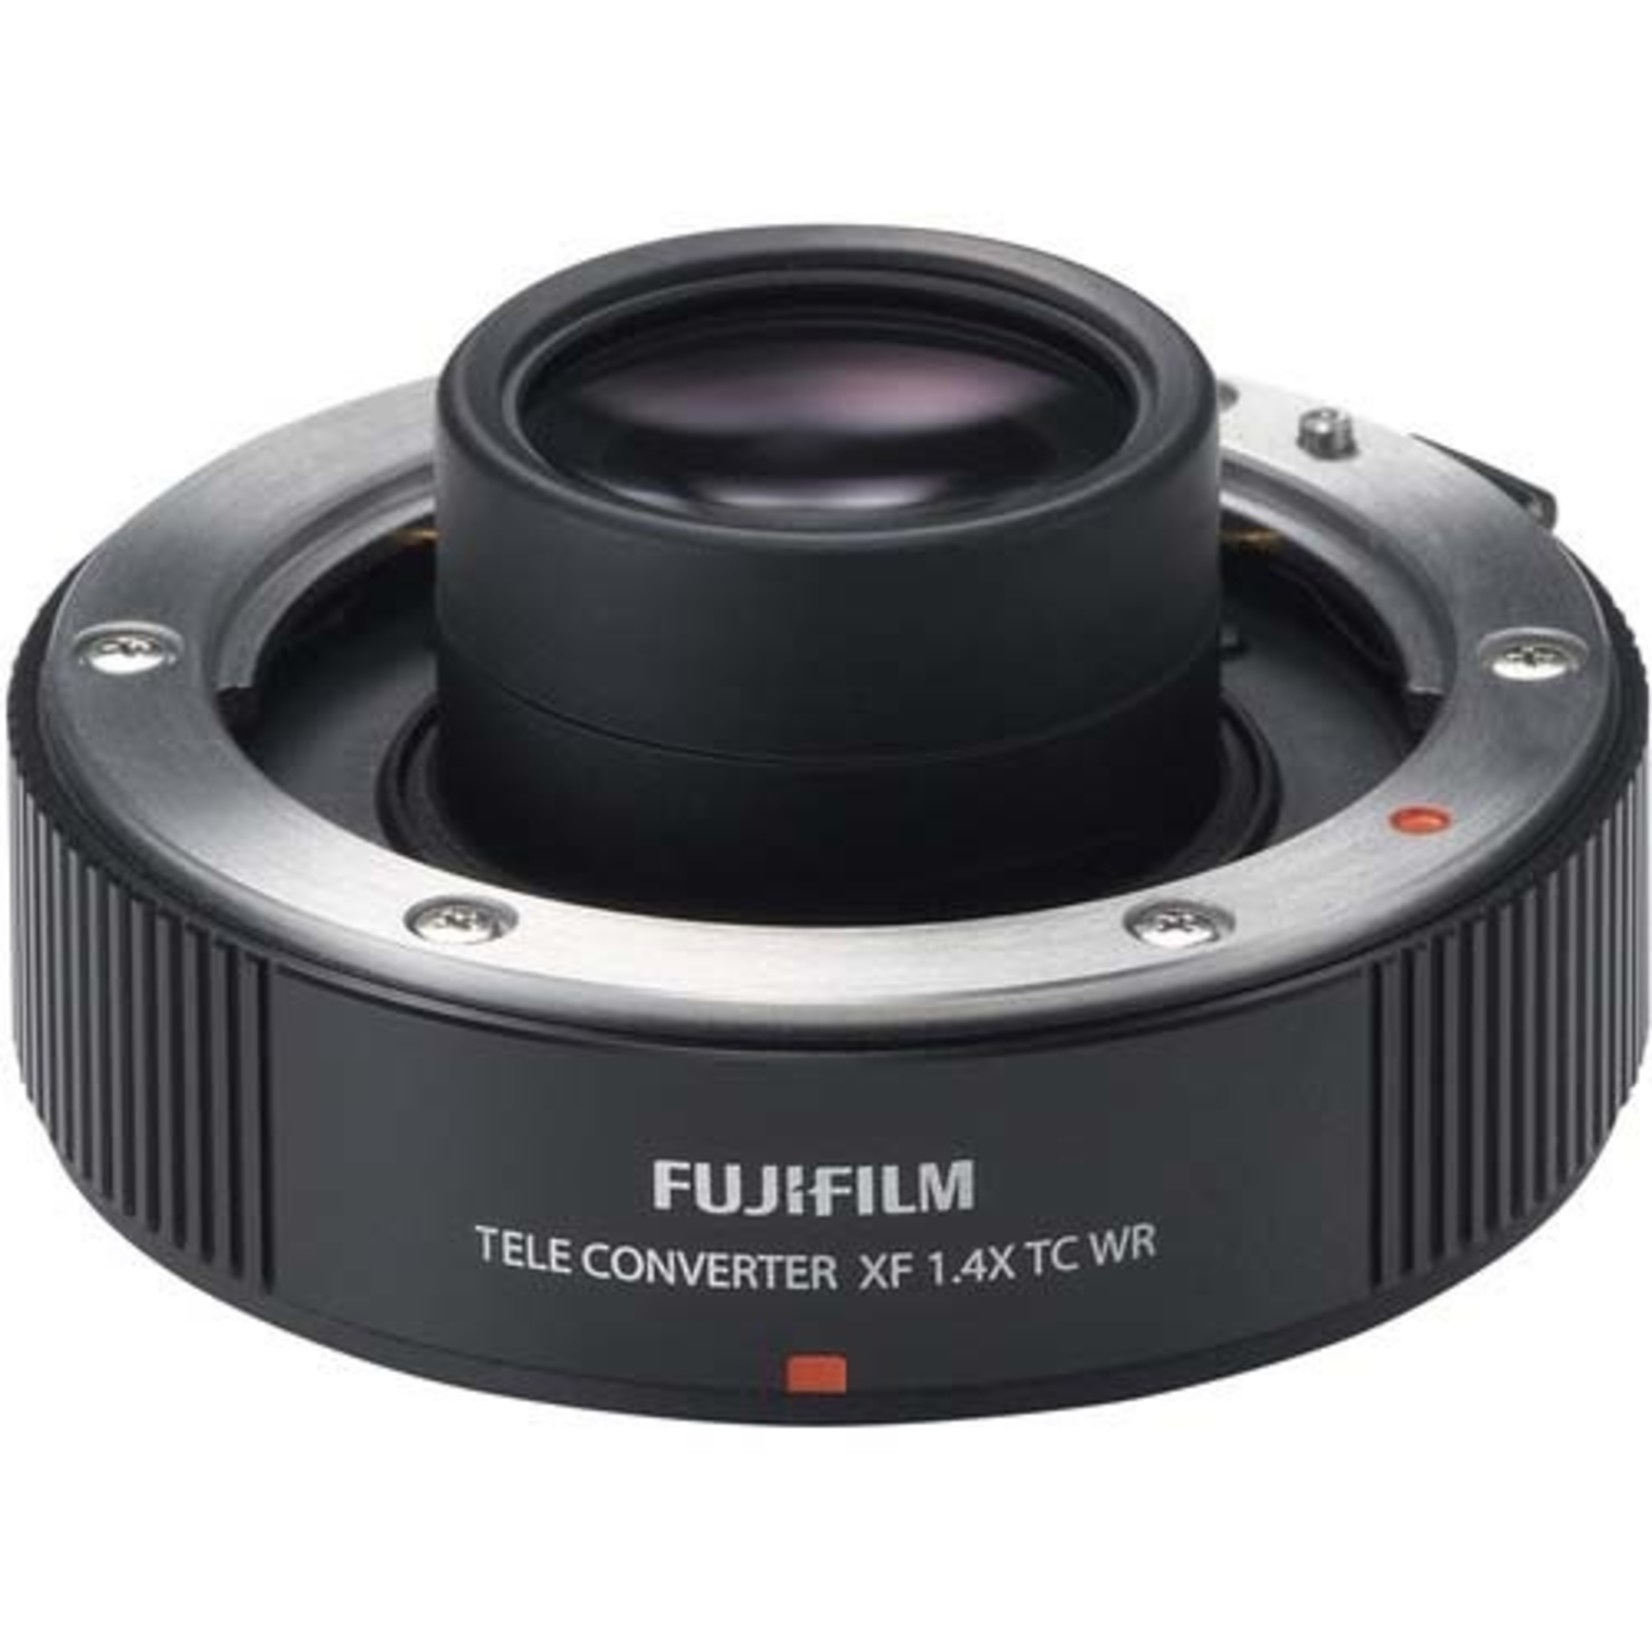 FujiFilm FujiFIlm XF 1.4 TC WR Teleconverter